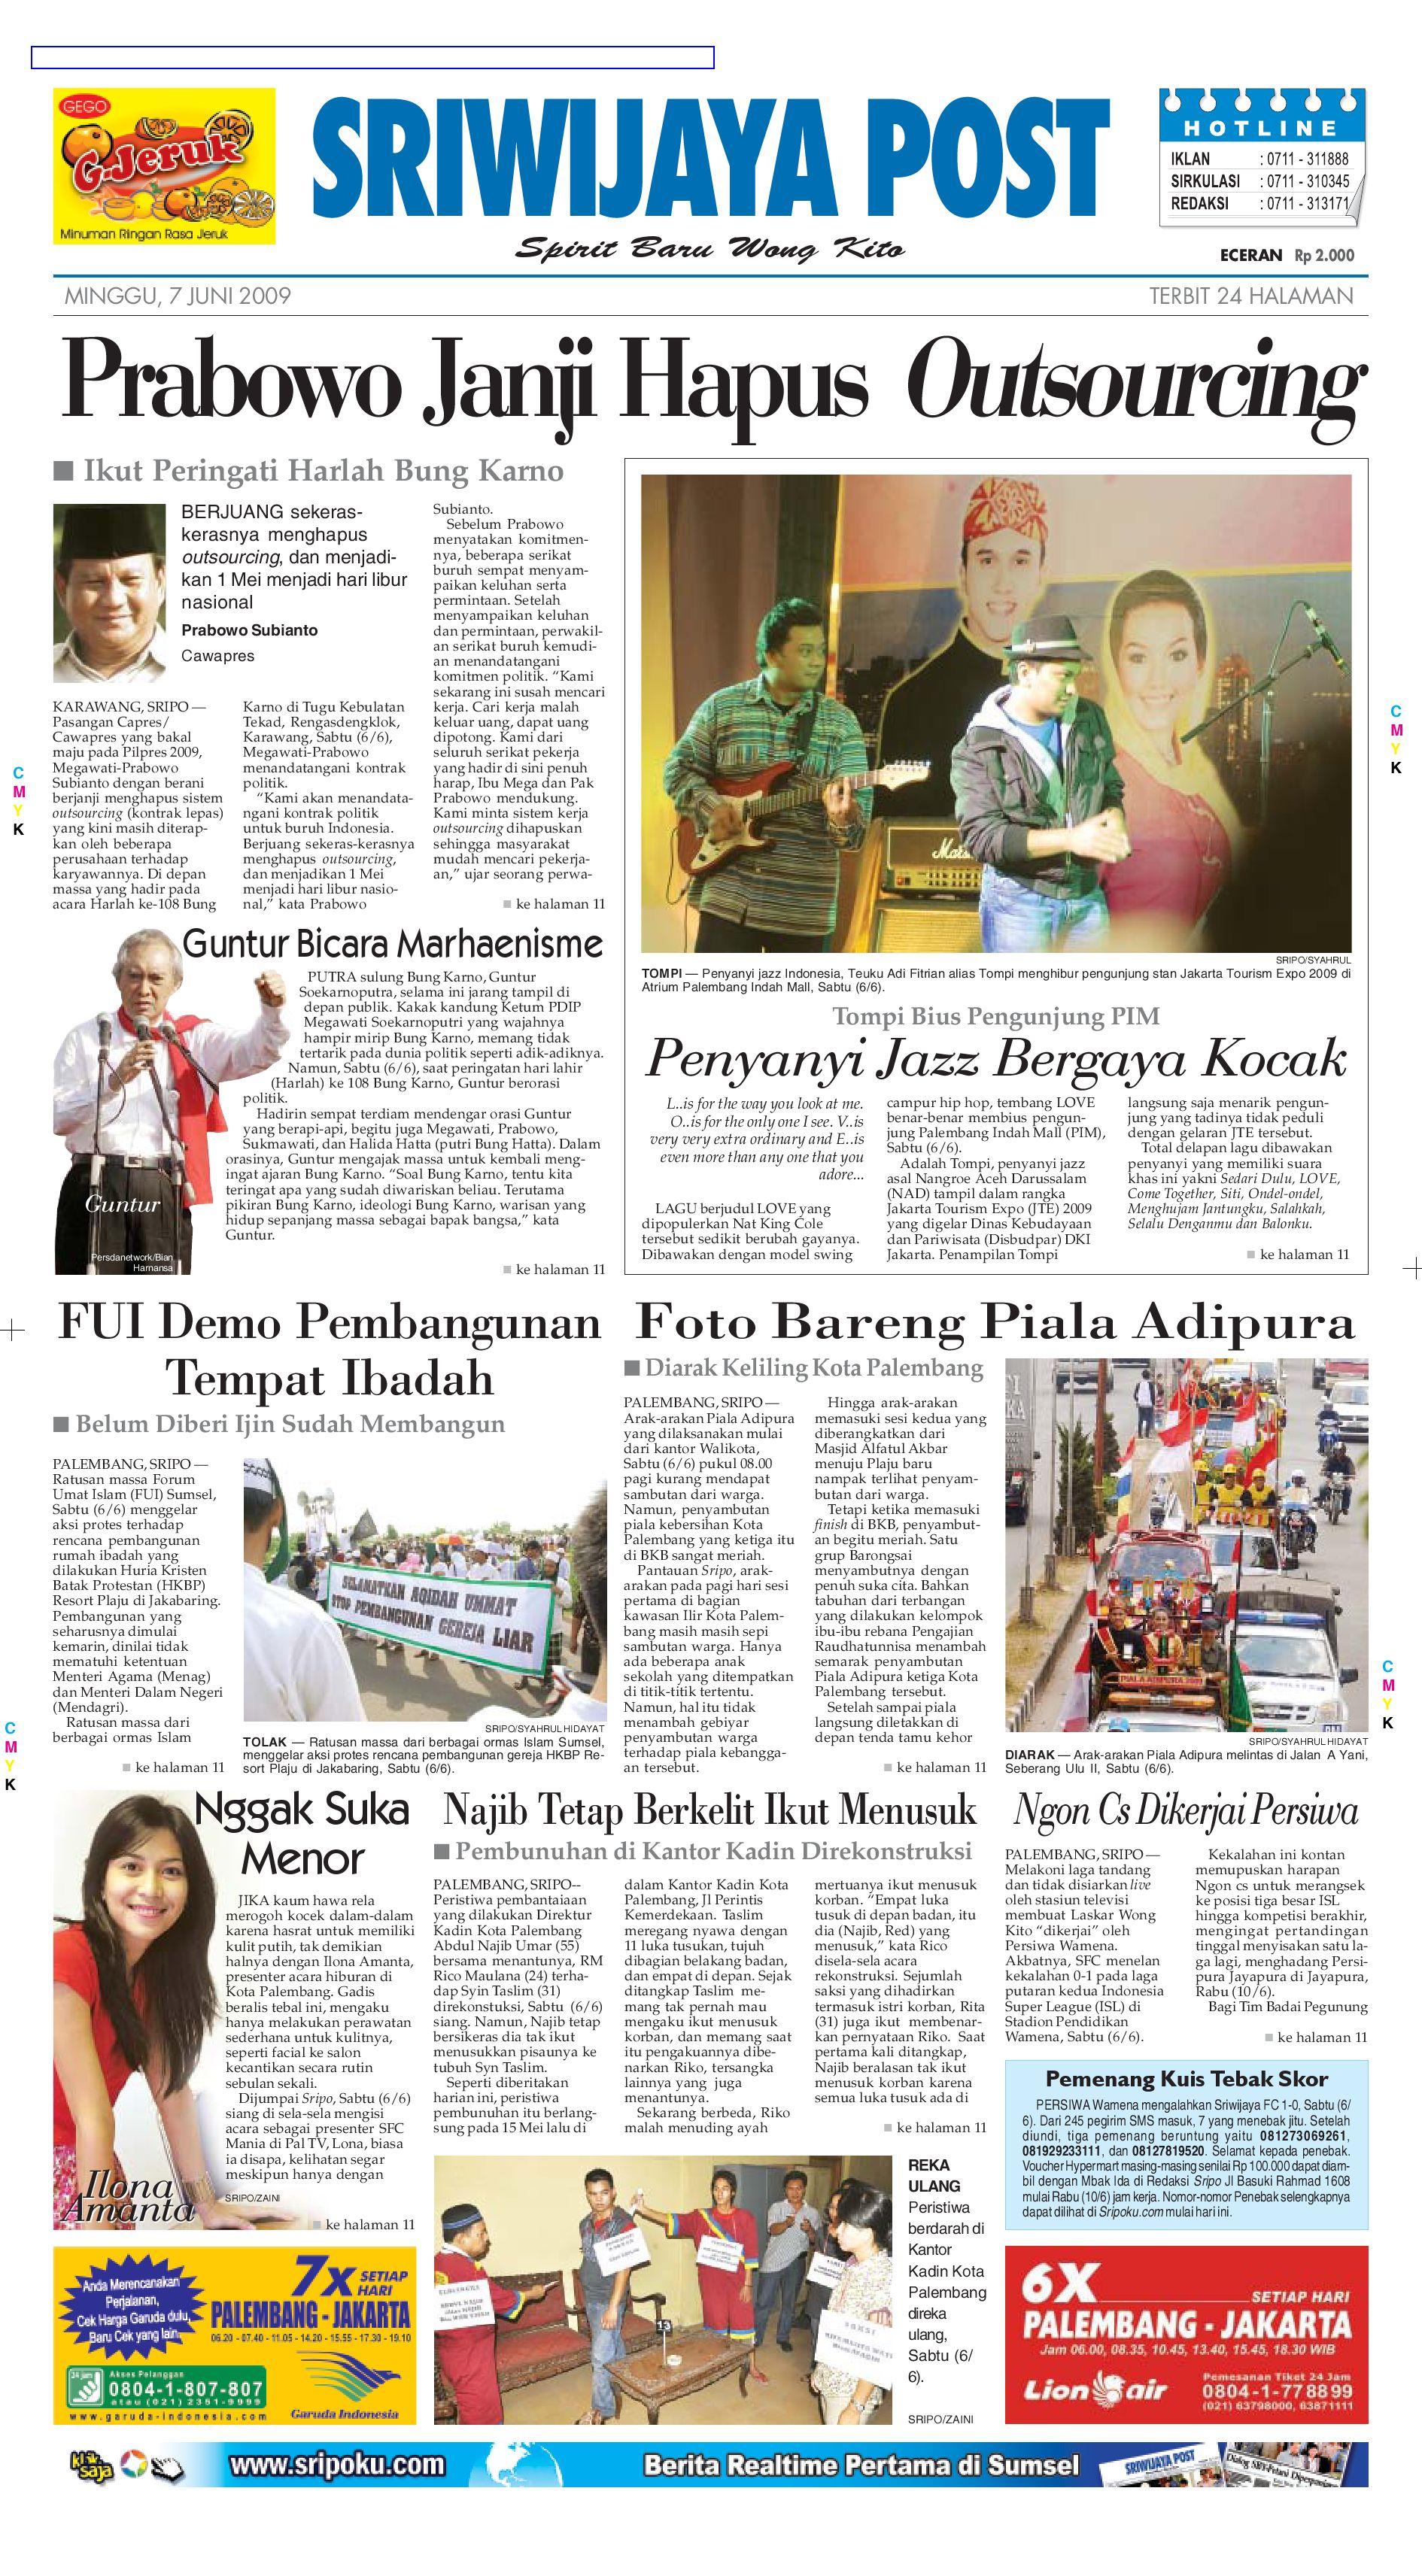 Sriwijaya Post Edisi Minggu 07 Juni 2009 By Yulius Saputra Issuu Agung Voucher Hypermart 50000 Bth